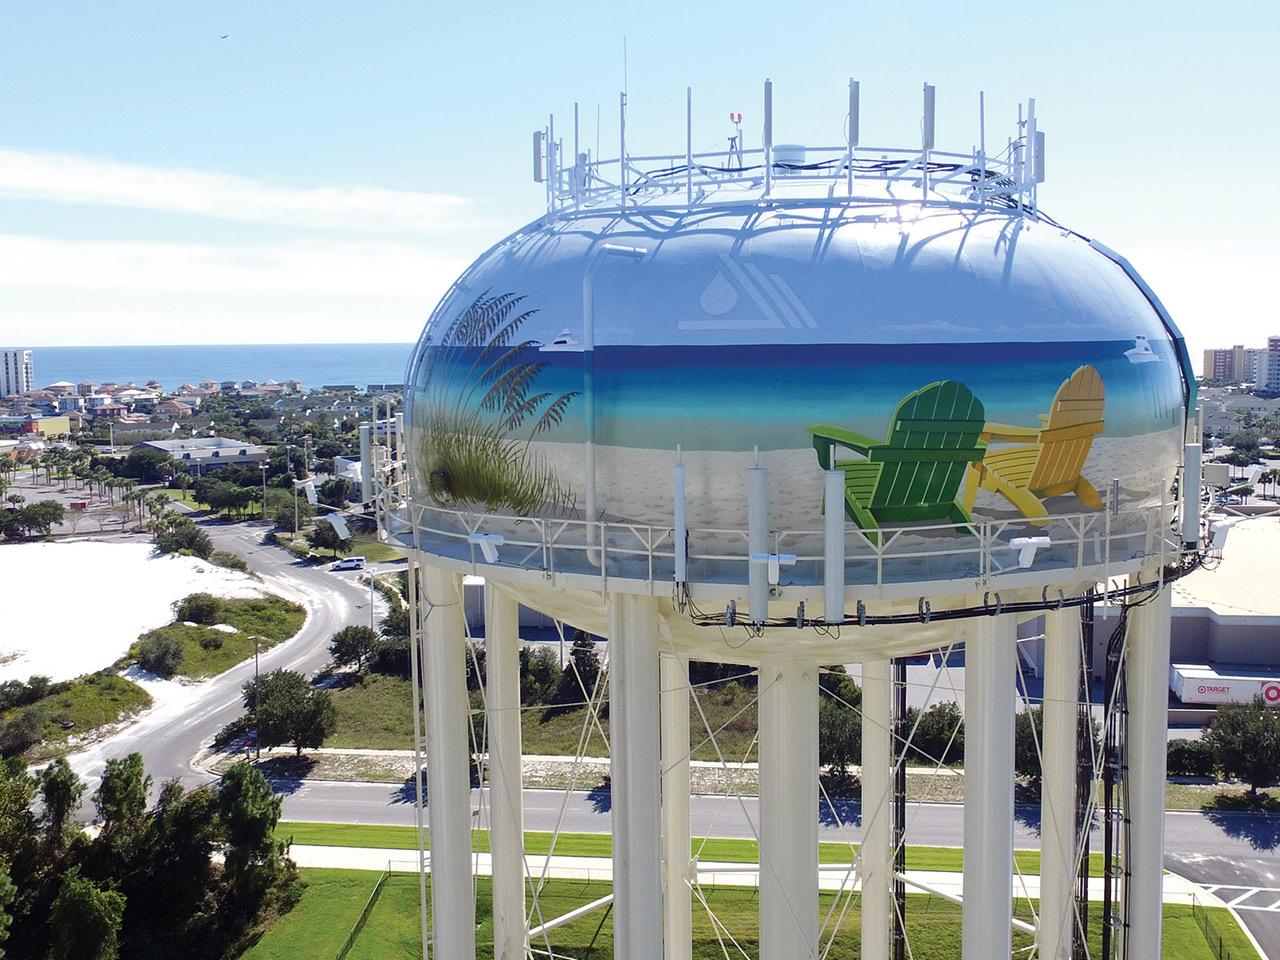 Last year's winning entry in Destin, Florida, was a 500,000-gallon legged tank that featured a beach scene by muralist Eric Henn